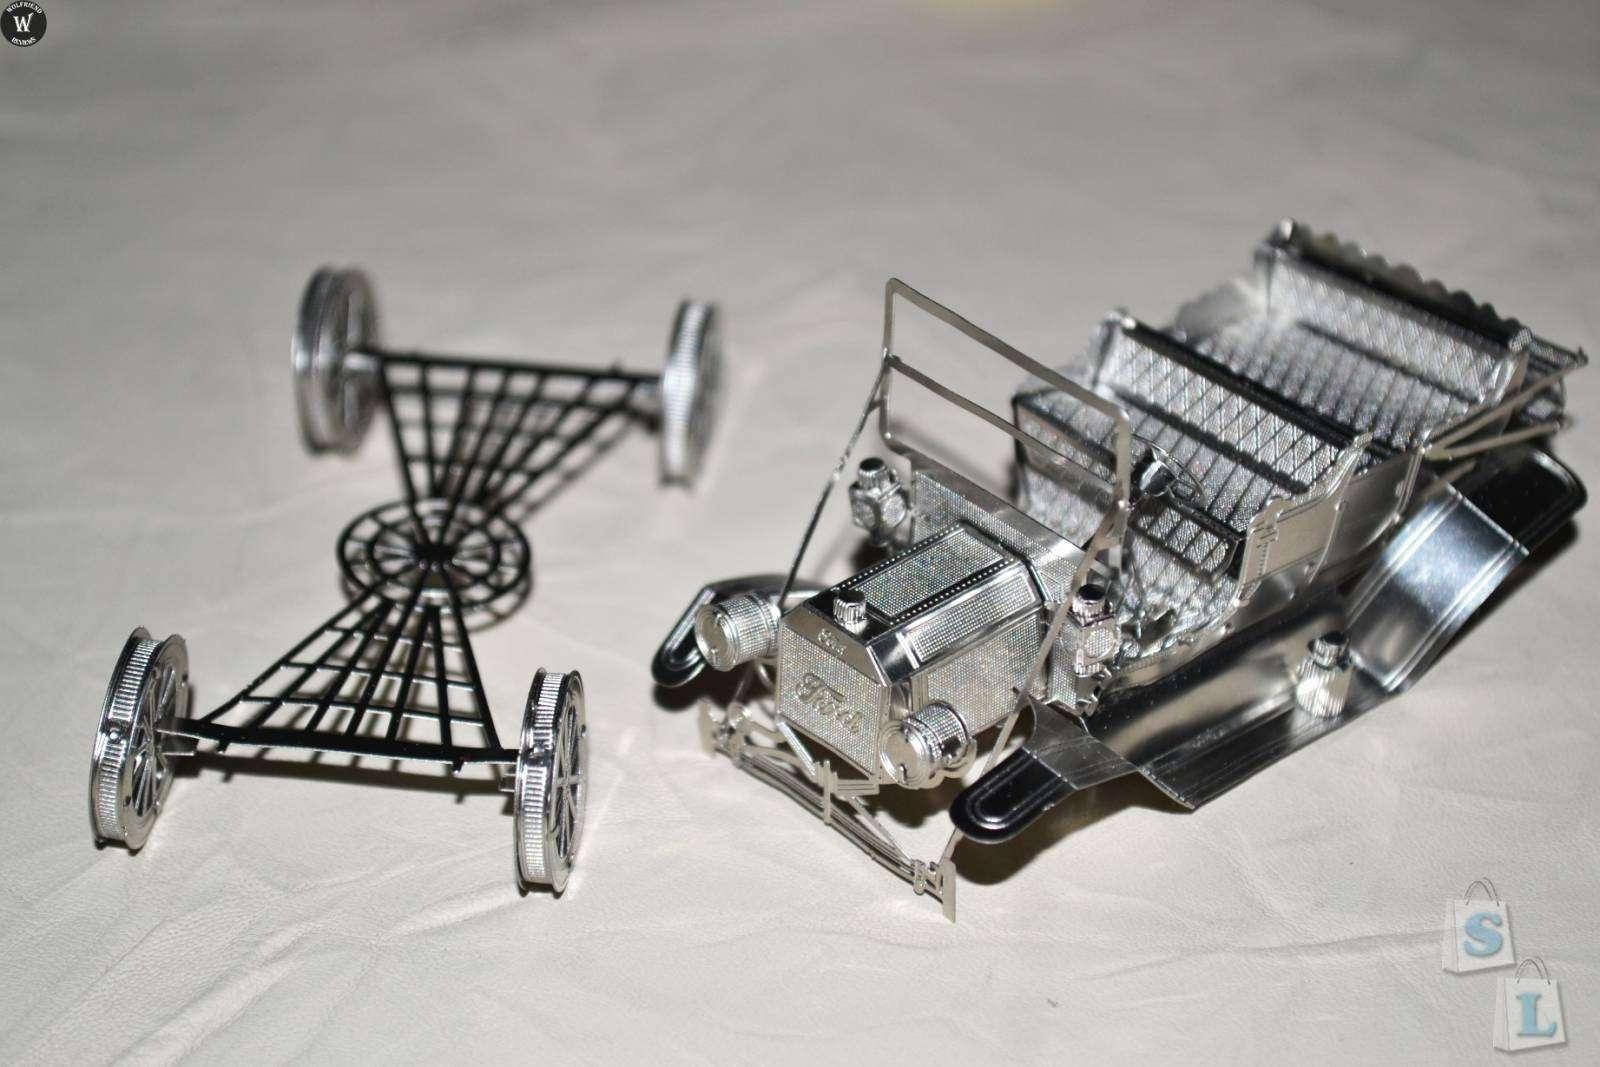 ChinaBuye: Металлический 3D пазл Ford Tin Lizzy, созданный самим Дьяволом